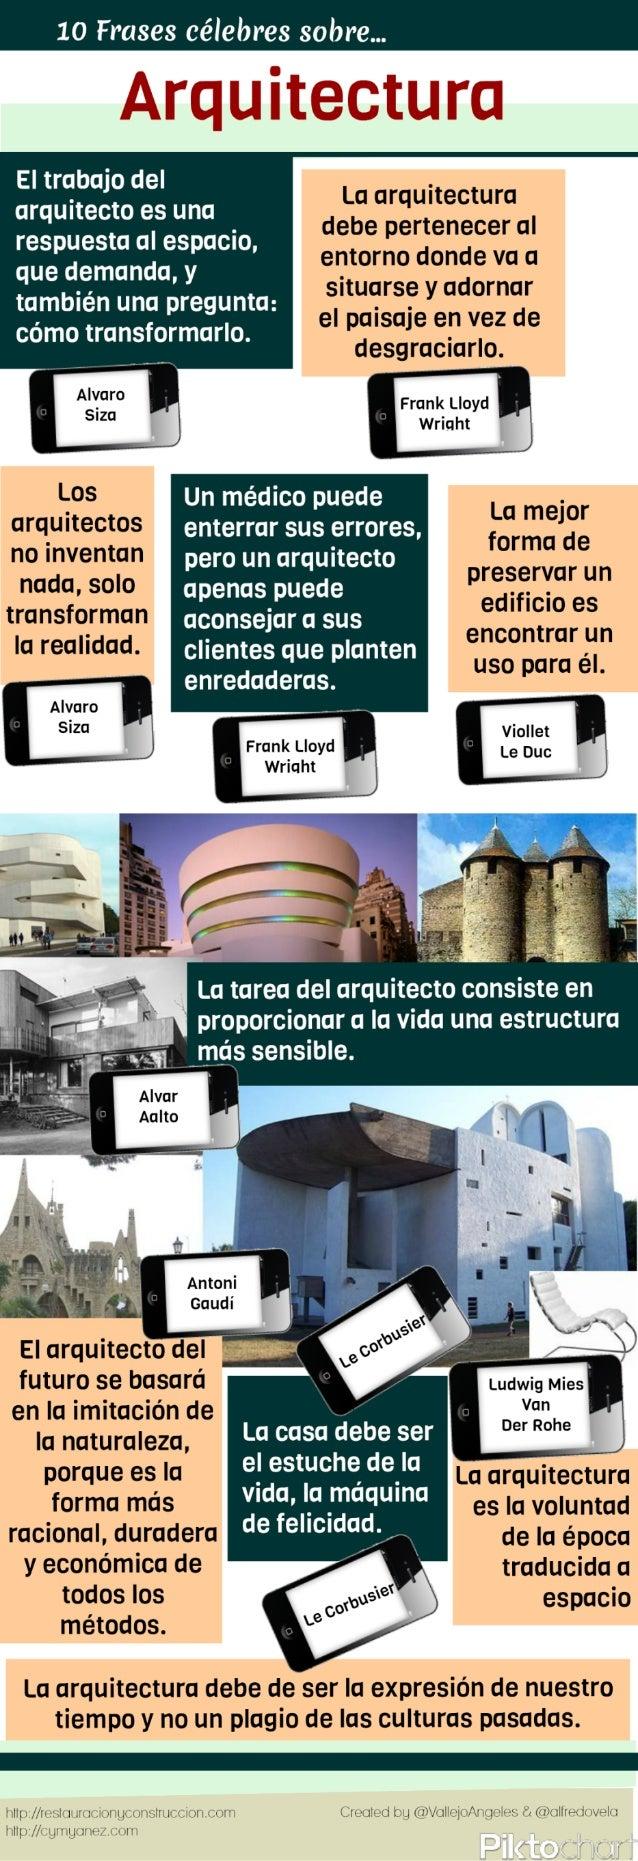 10 citas célebres sobre arquitectura